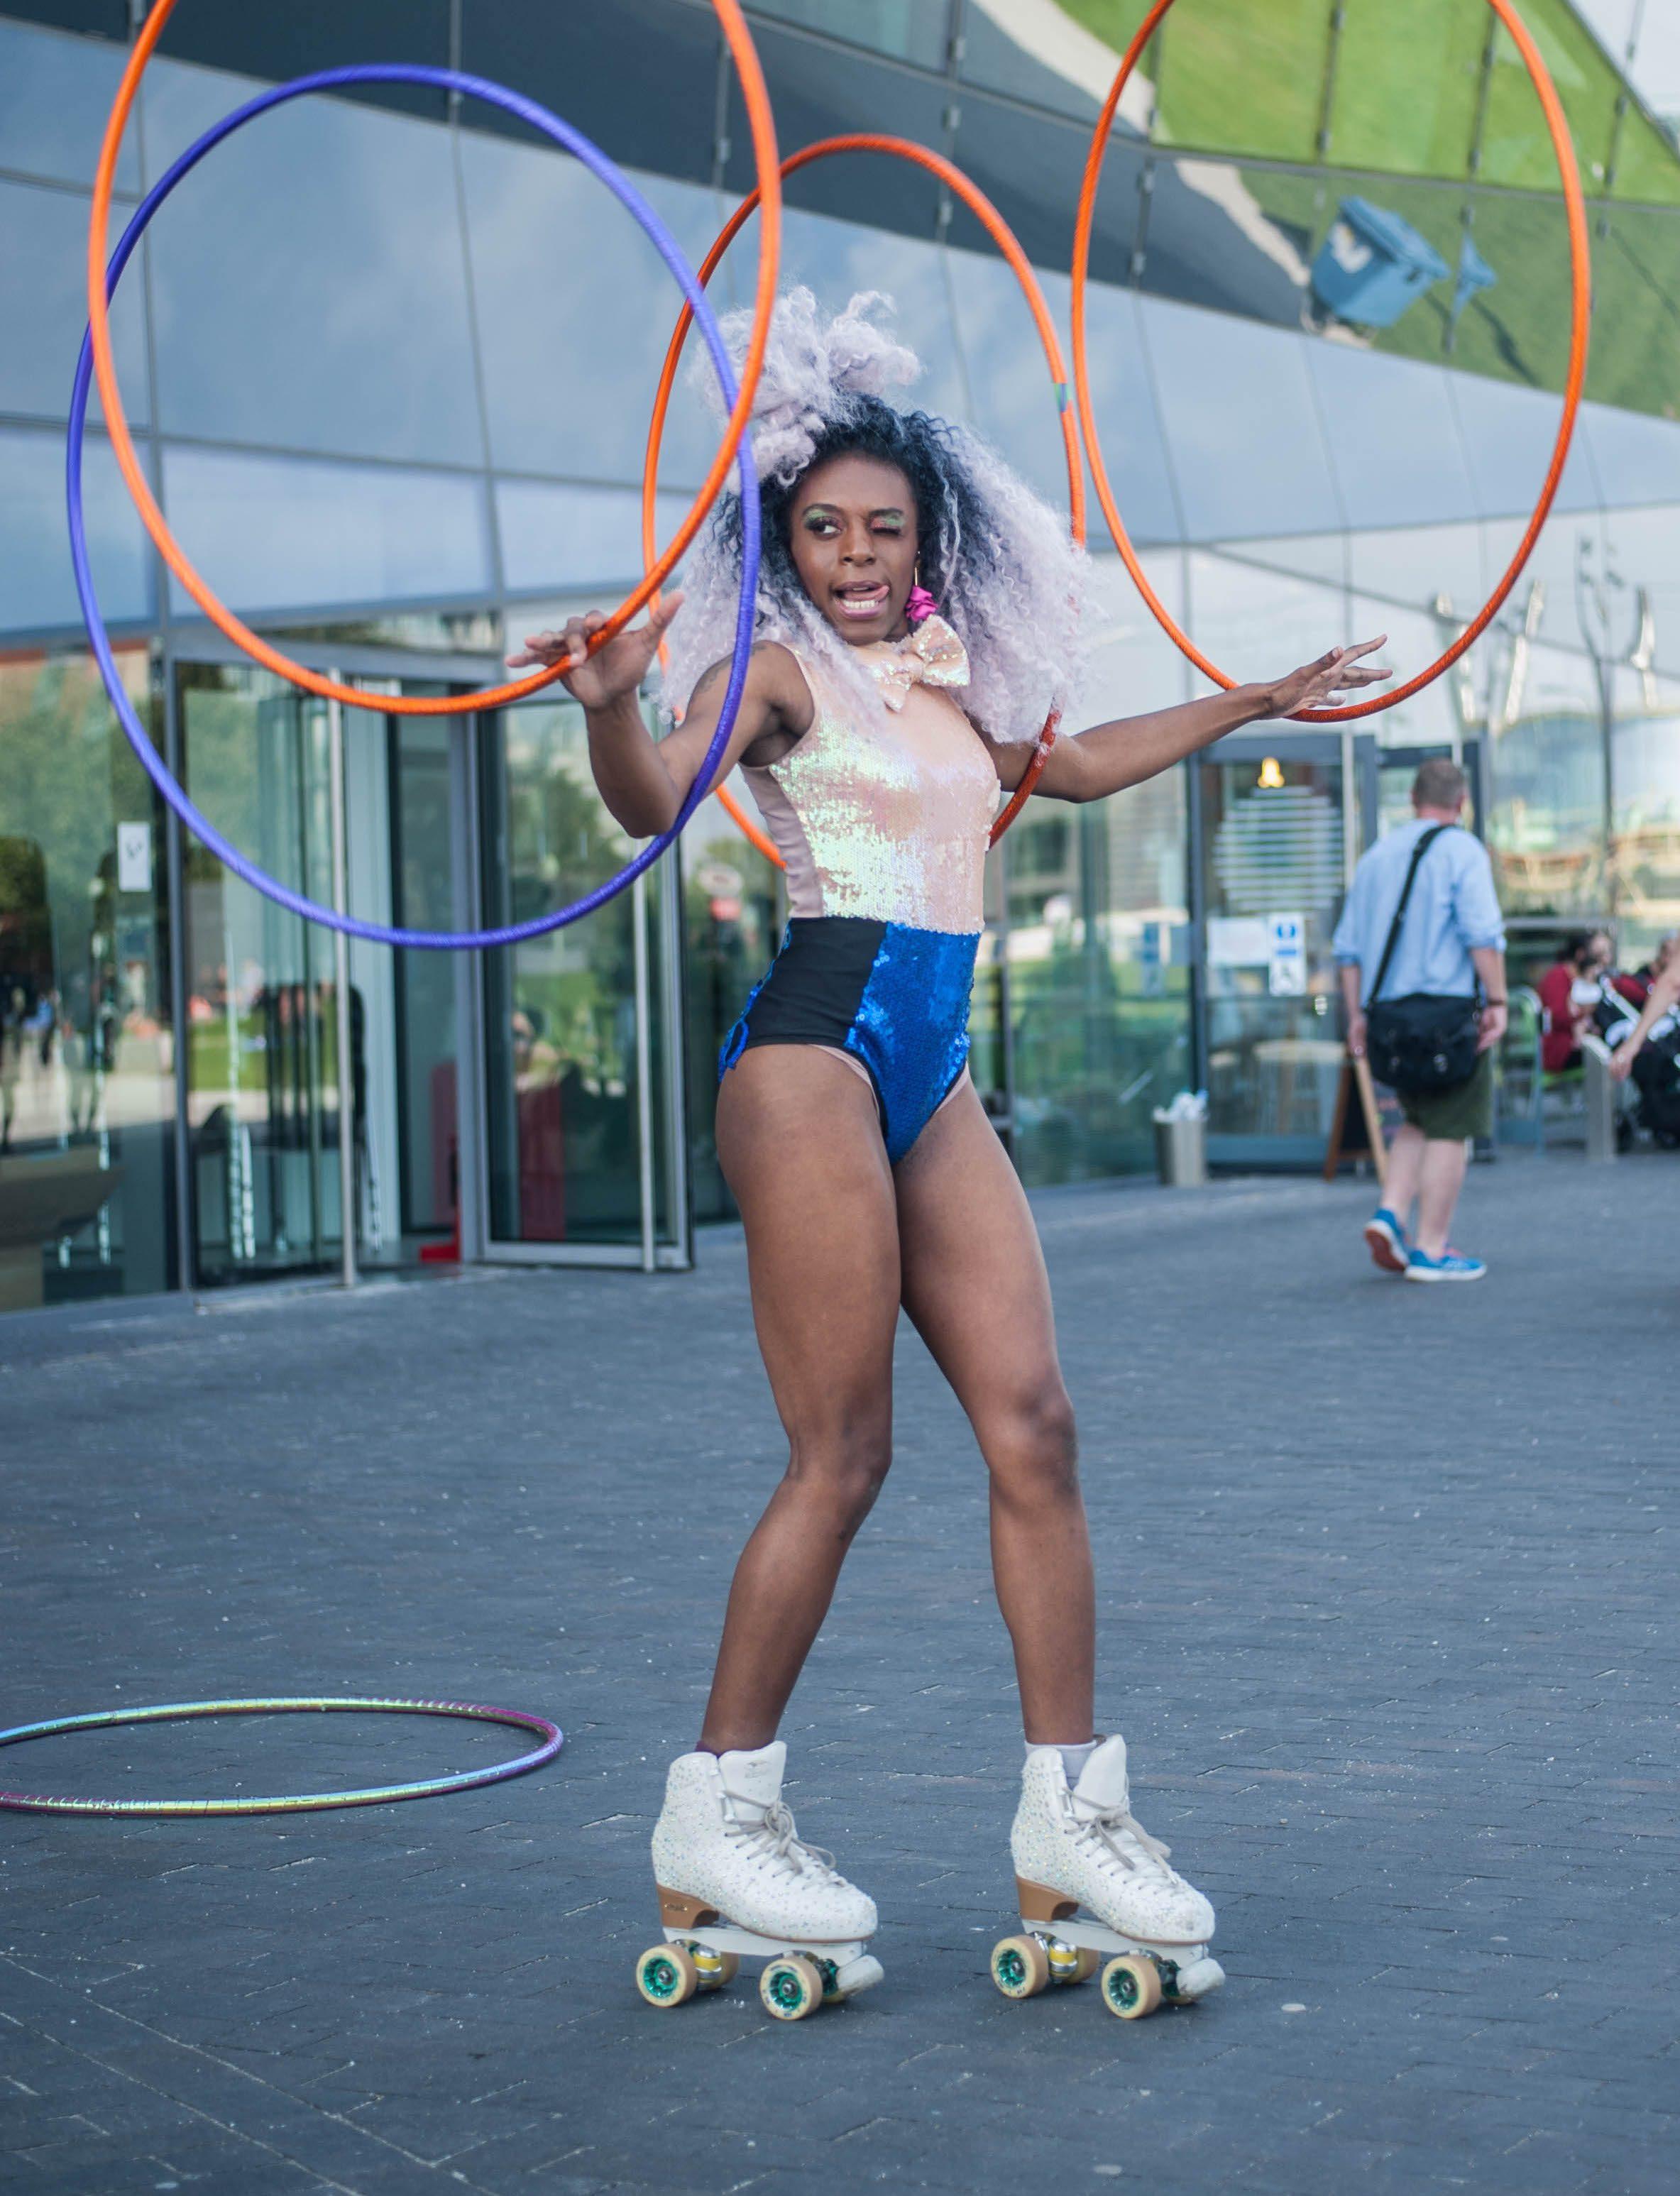 A woman wearing rollerskates carrying hula hoops